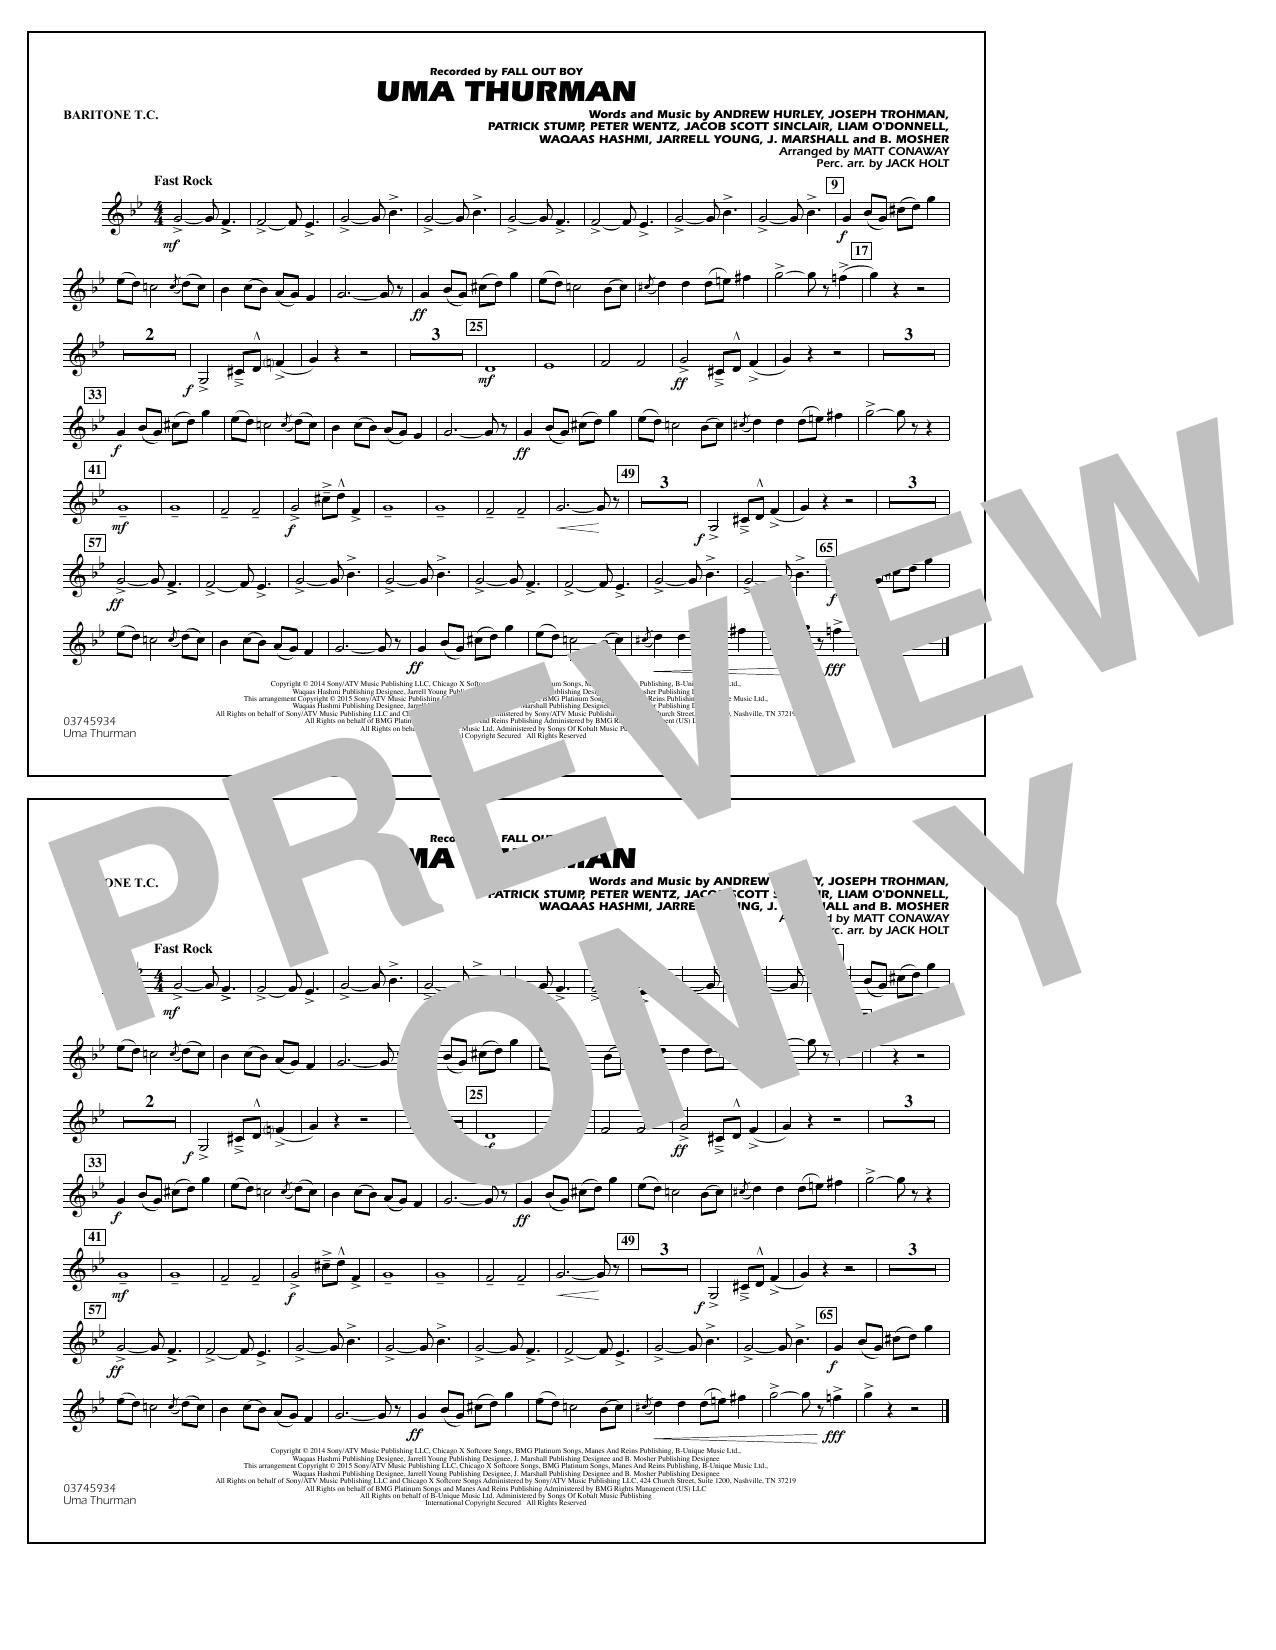 Uma Thurman - Baritone T.C. (Marching Band)